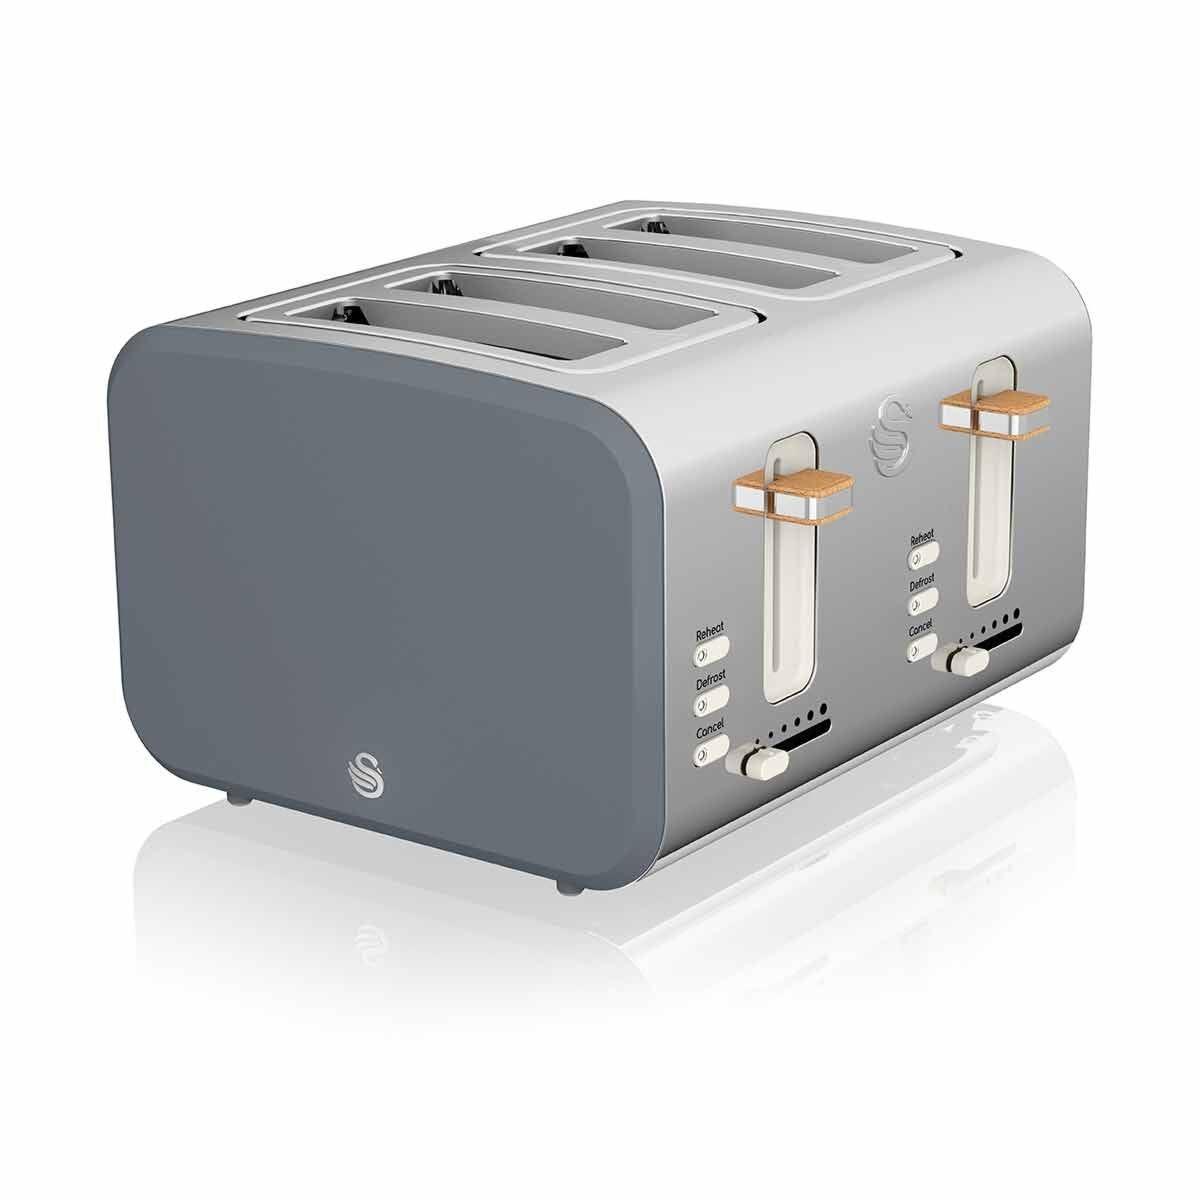 Swan 4 Slice Nordic Toaster 1500W